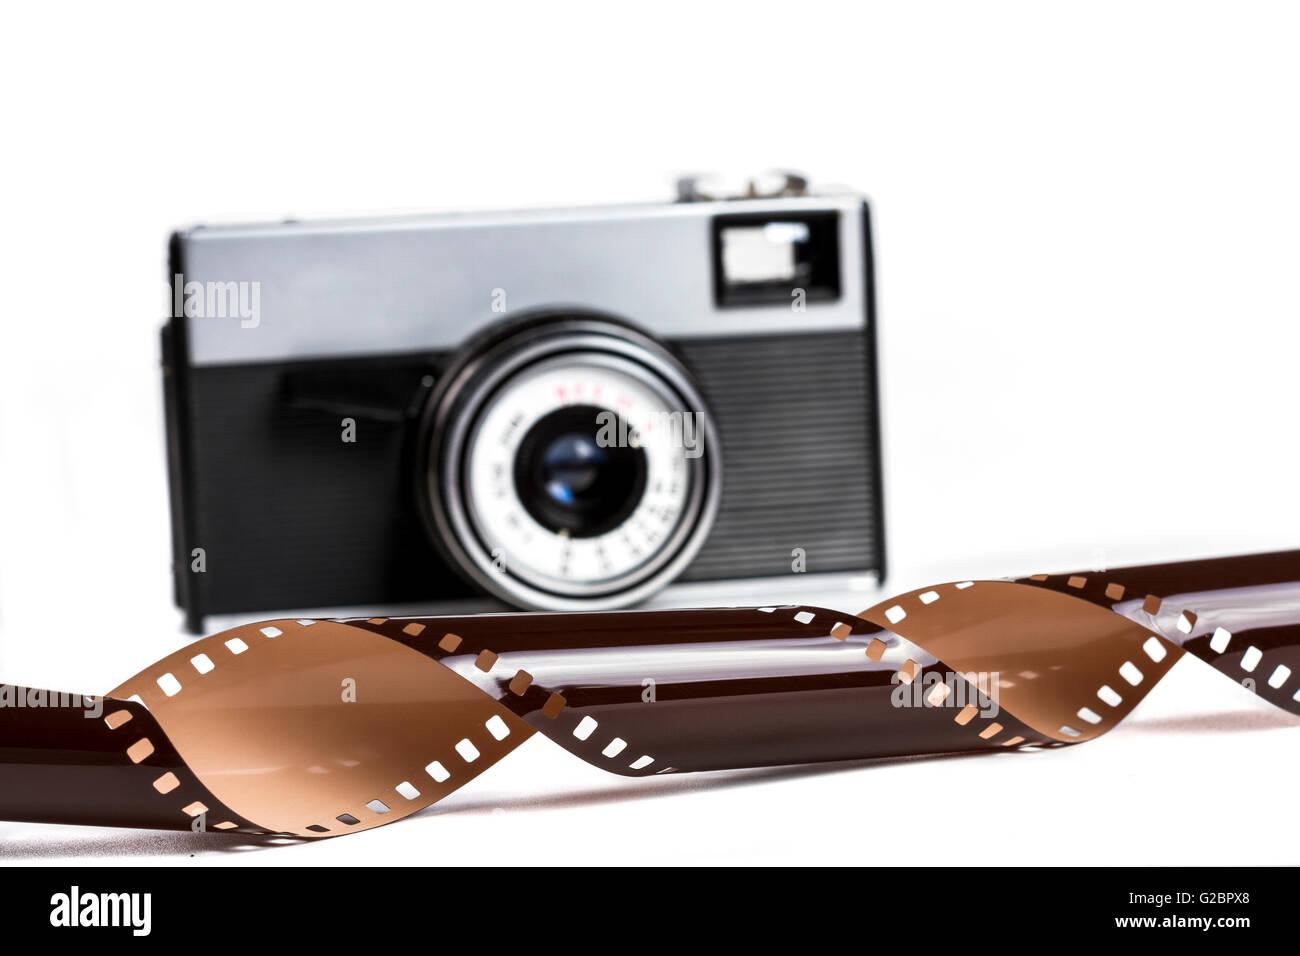 Old Film Camera Isolated on White Background - Stock Image